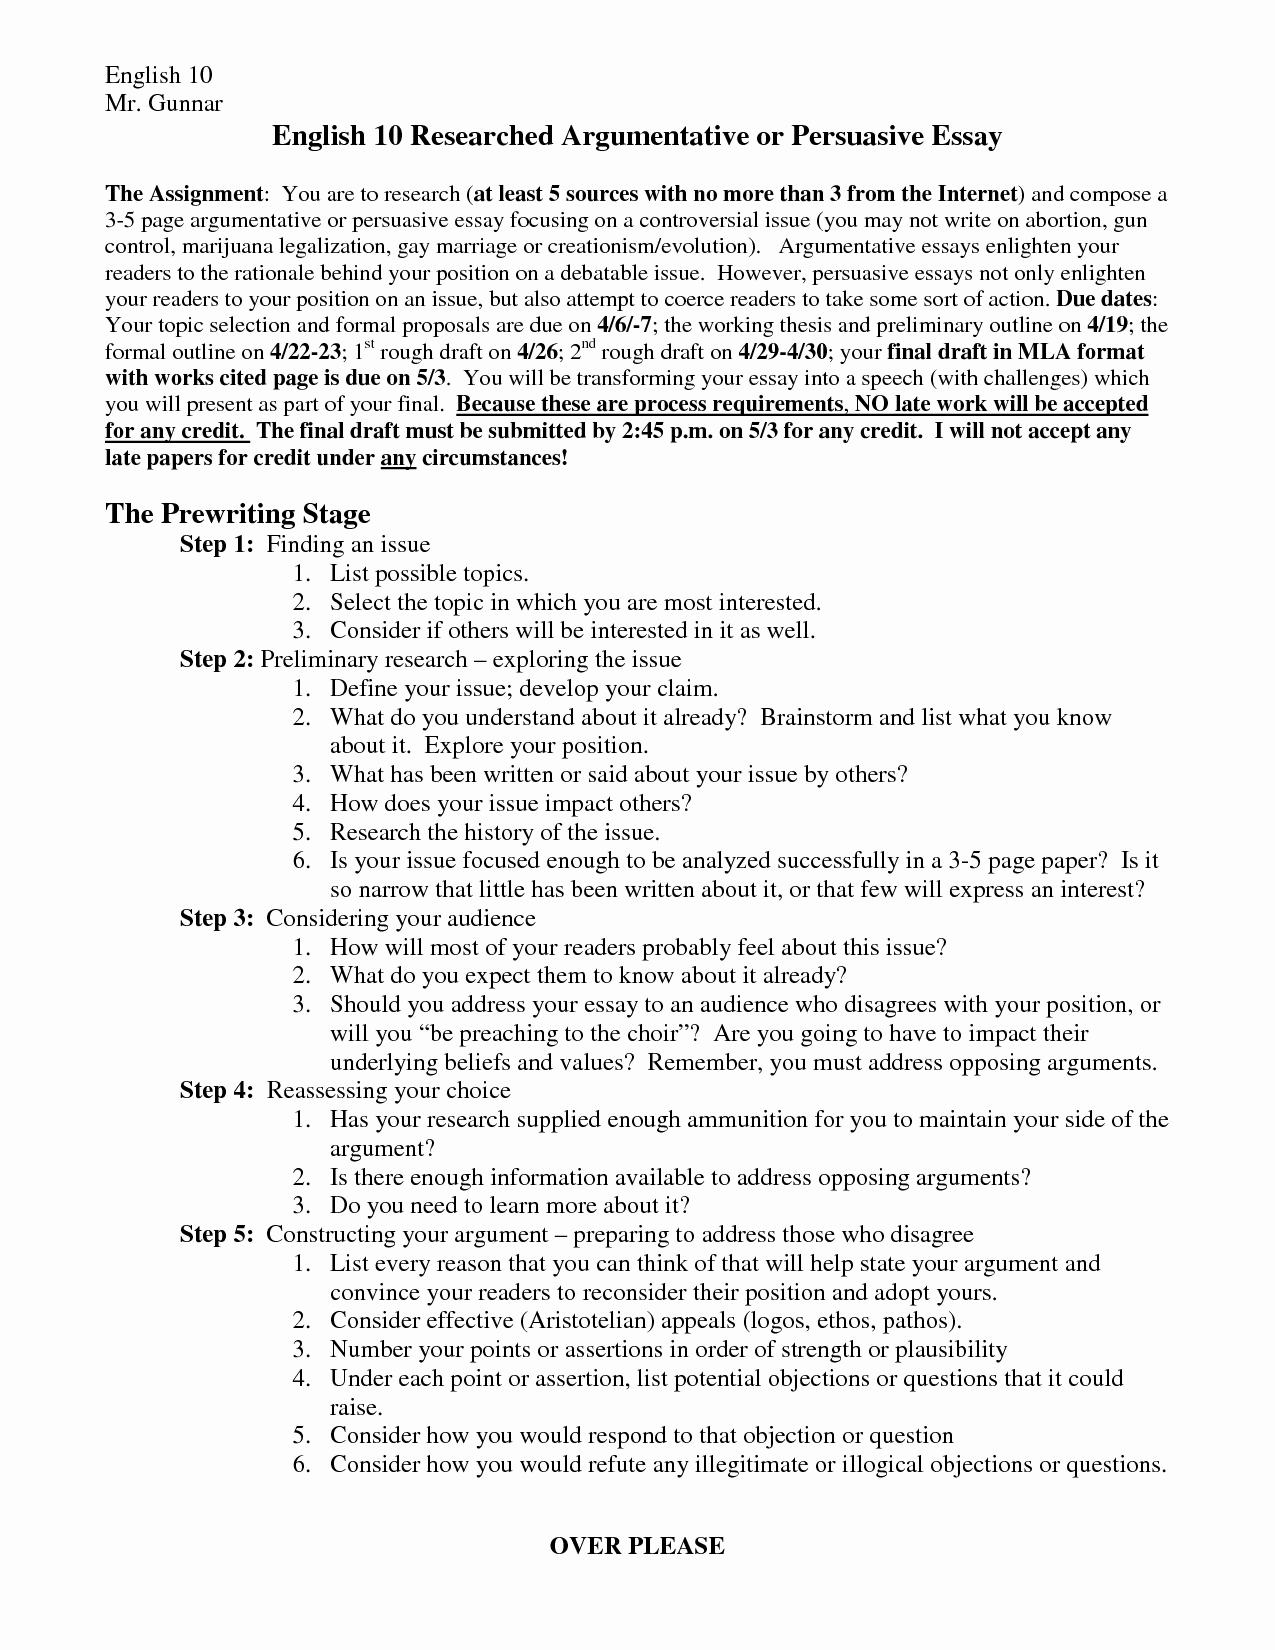 Mla format Outline Template Elegant Research Paper Outline Template Mla format Mla format for